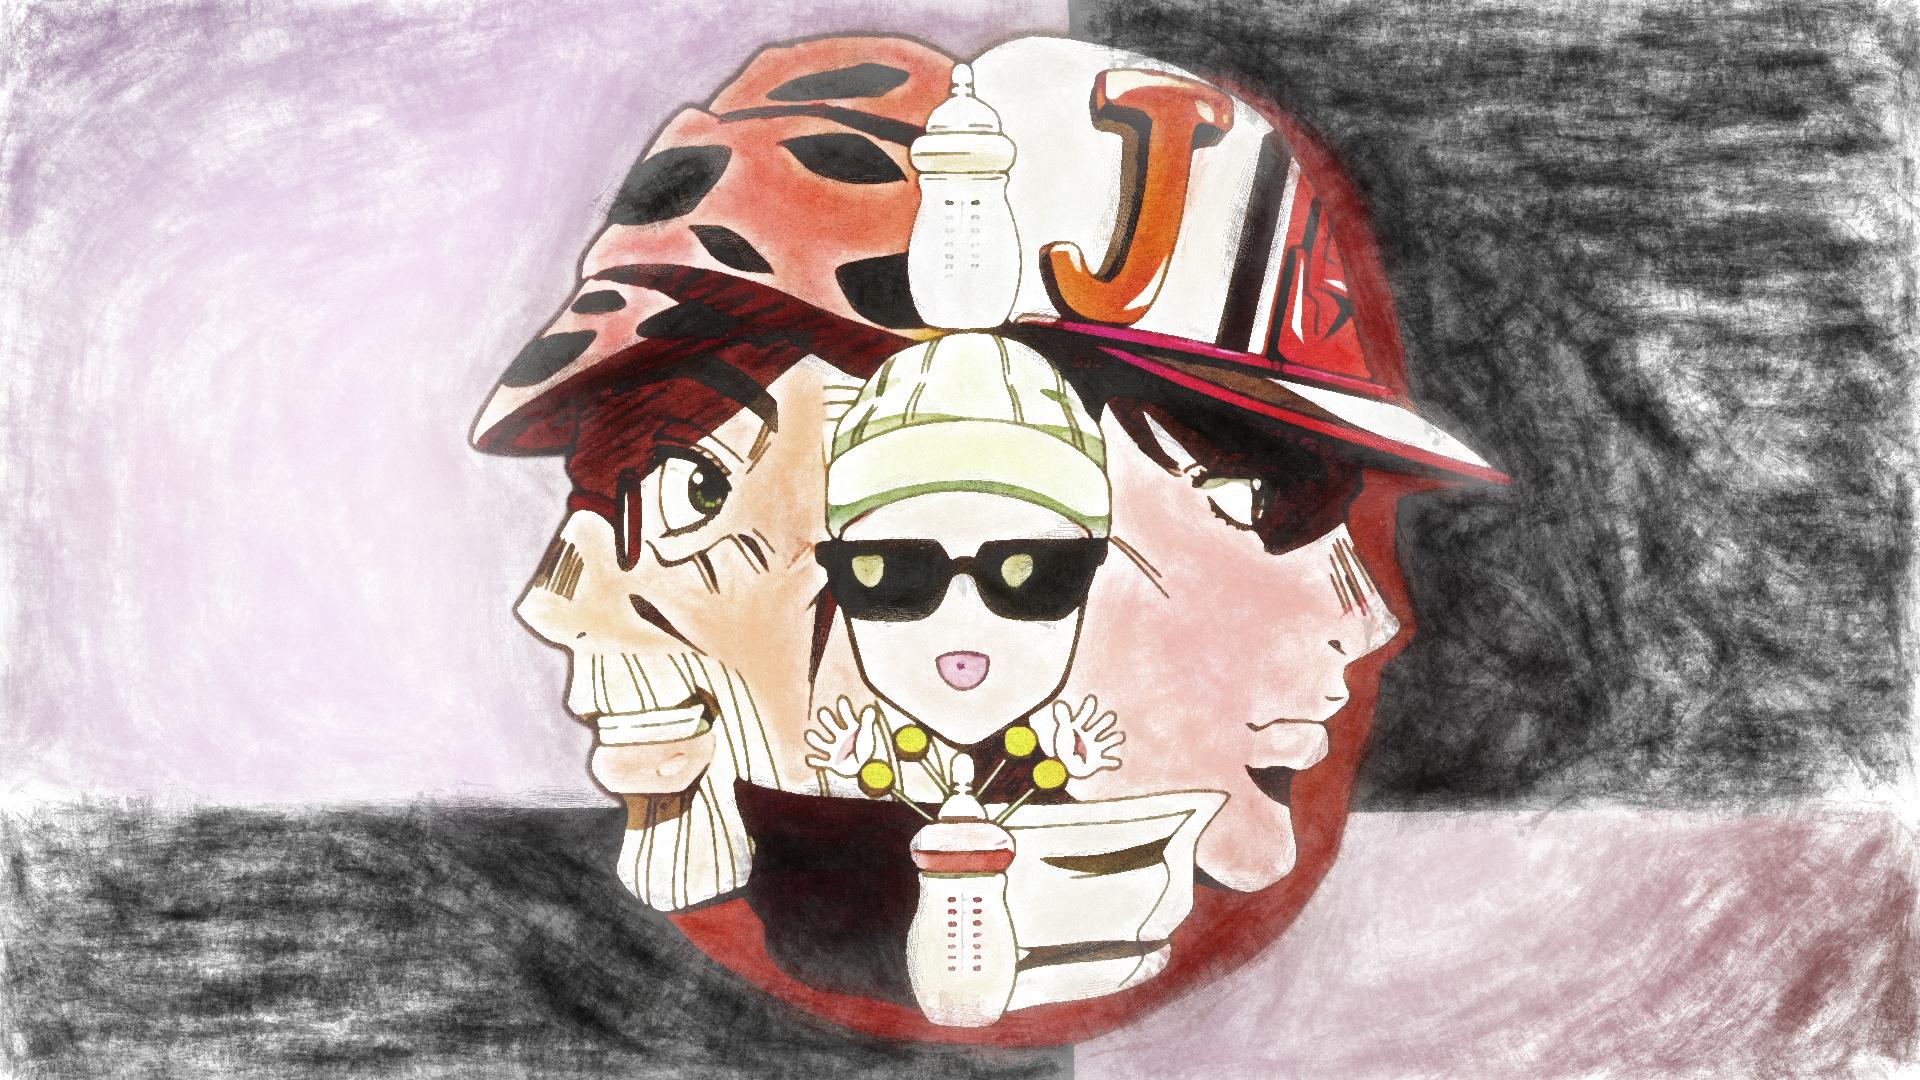 Desktop Wallpaper Joseph, Joestar, Jotaro, Kujo, Anime